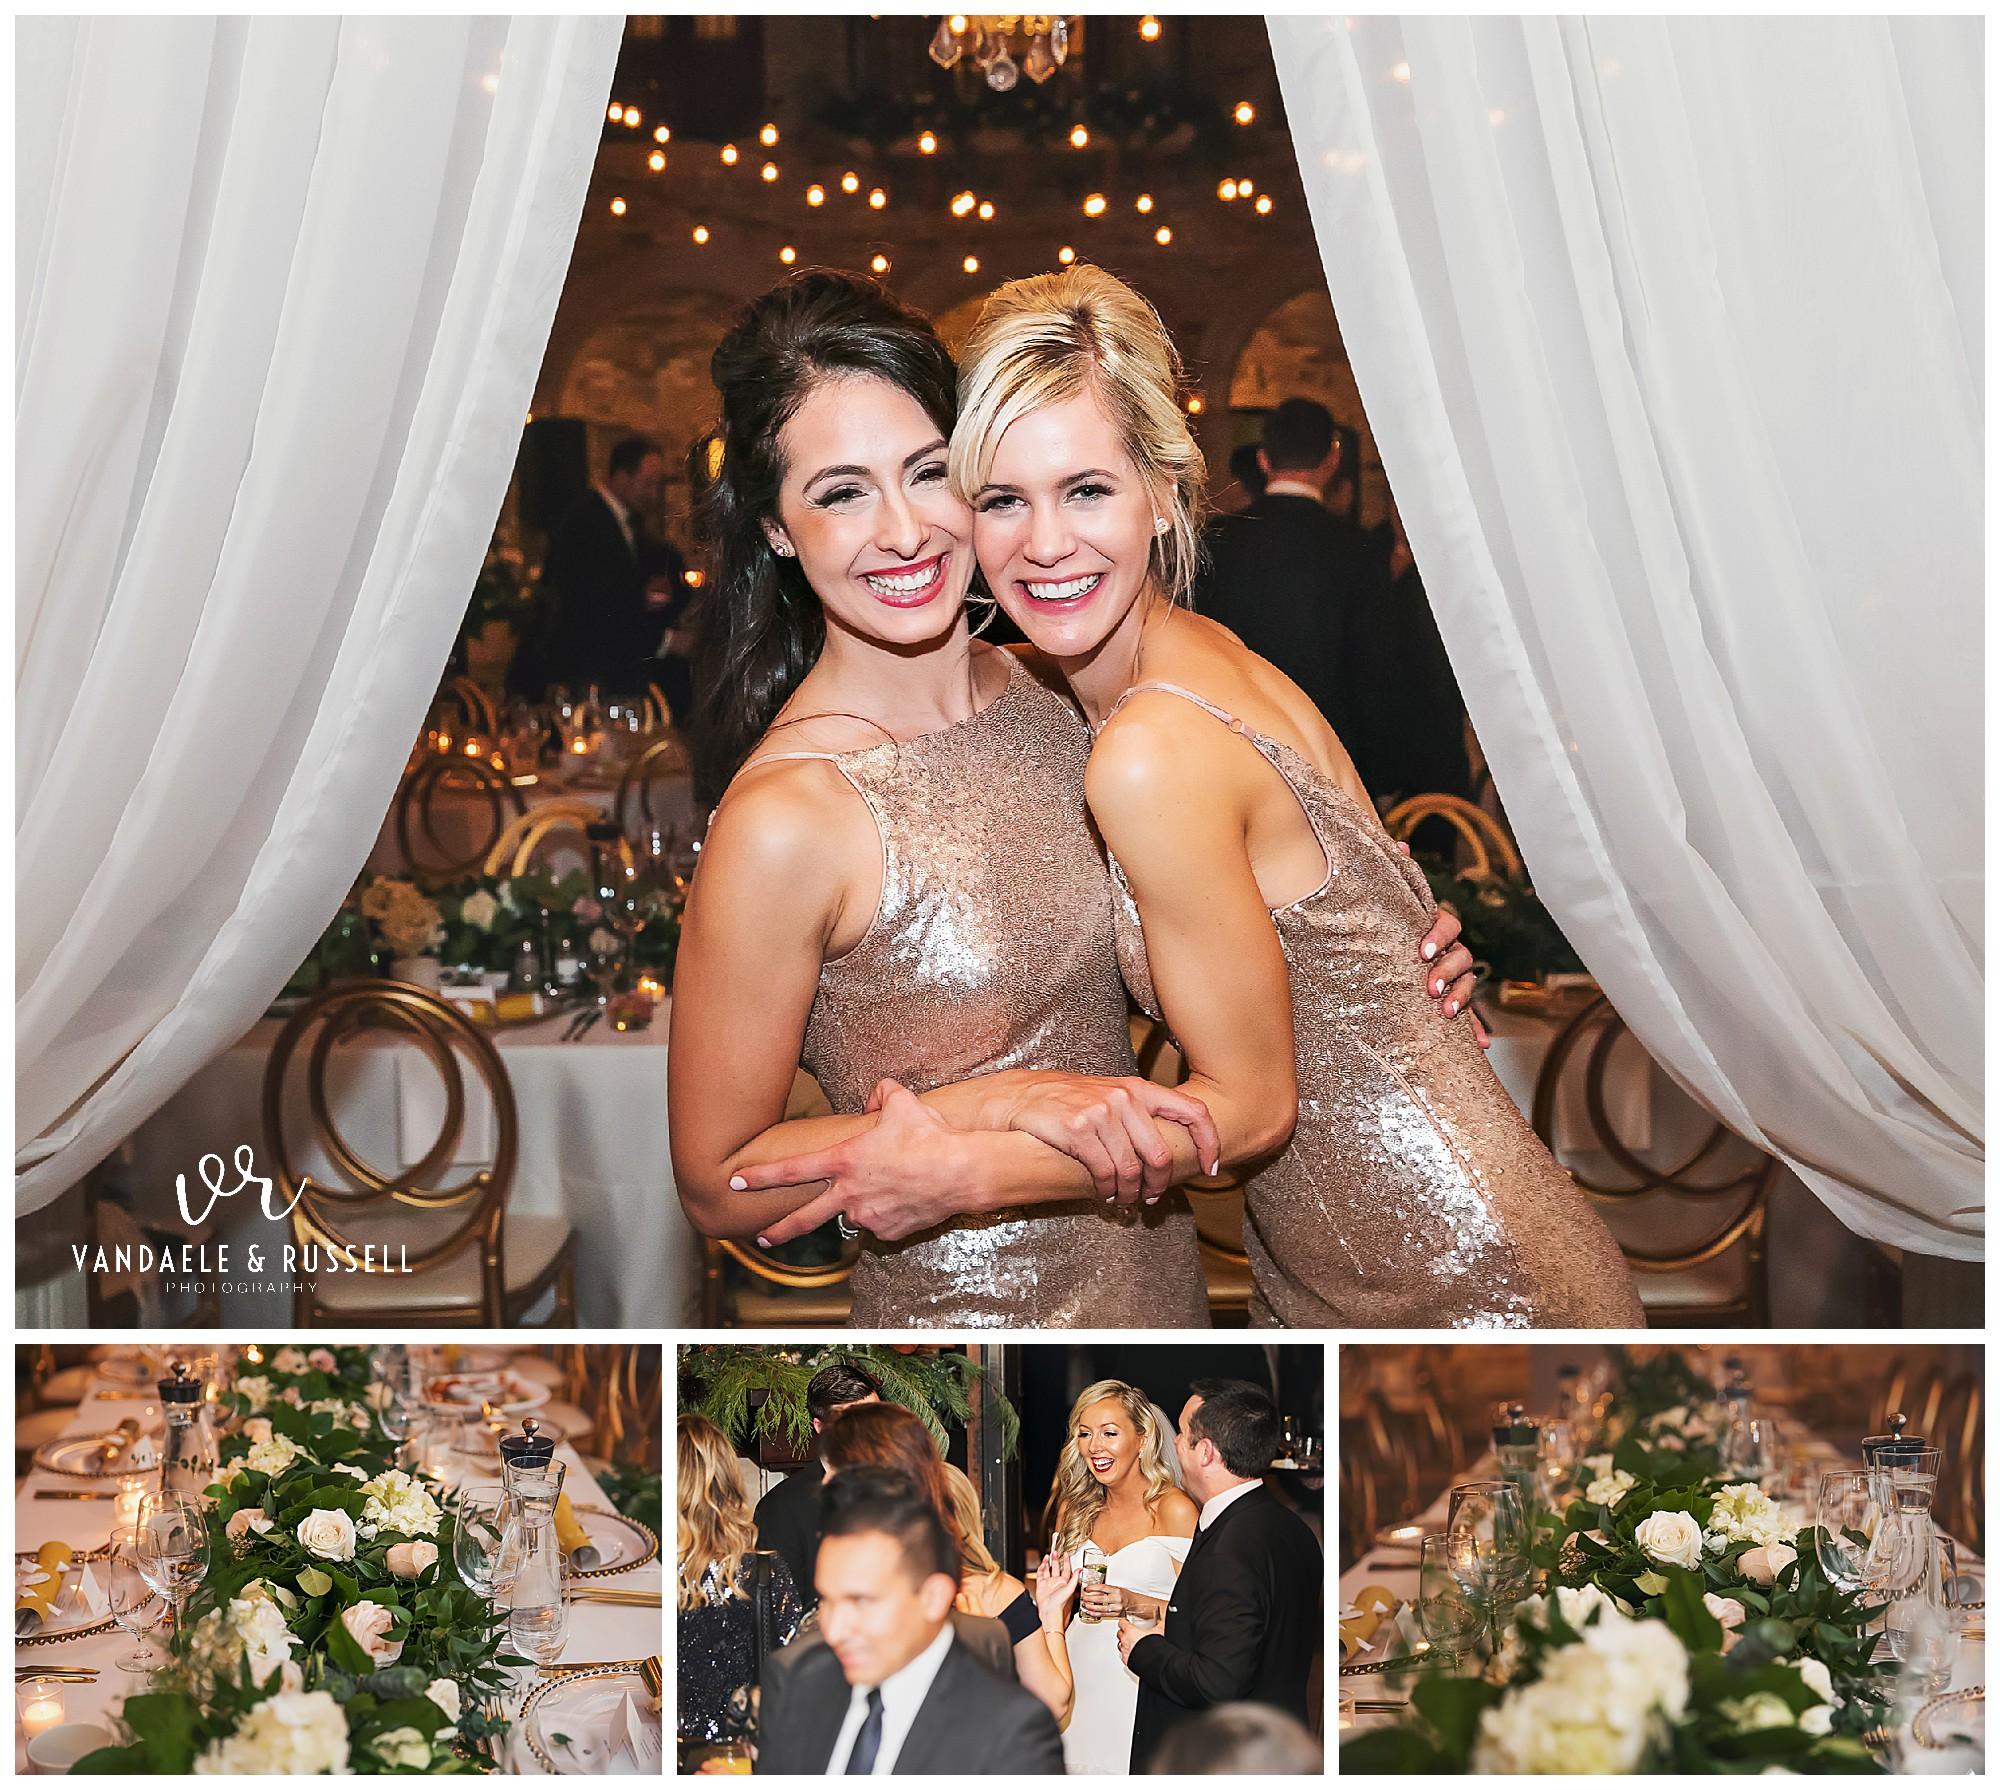 Hacienda-Sarria-Wedding-Photos-NYE-Michelle-Matt-VanDaele-Russell_0038.jpg